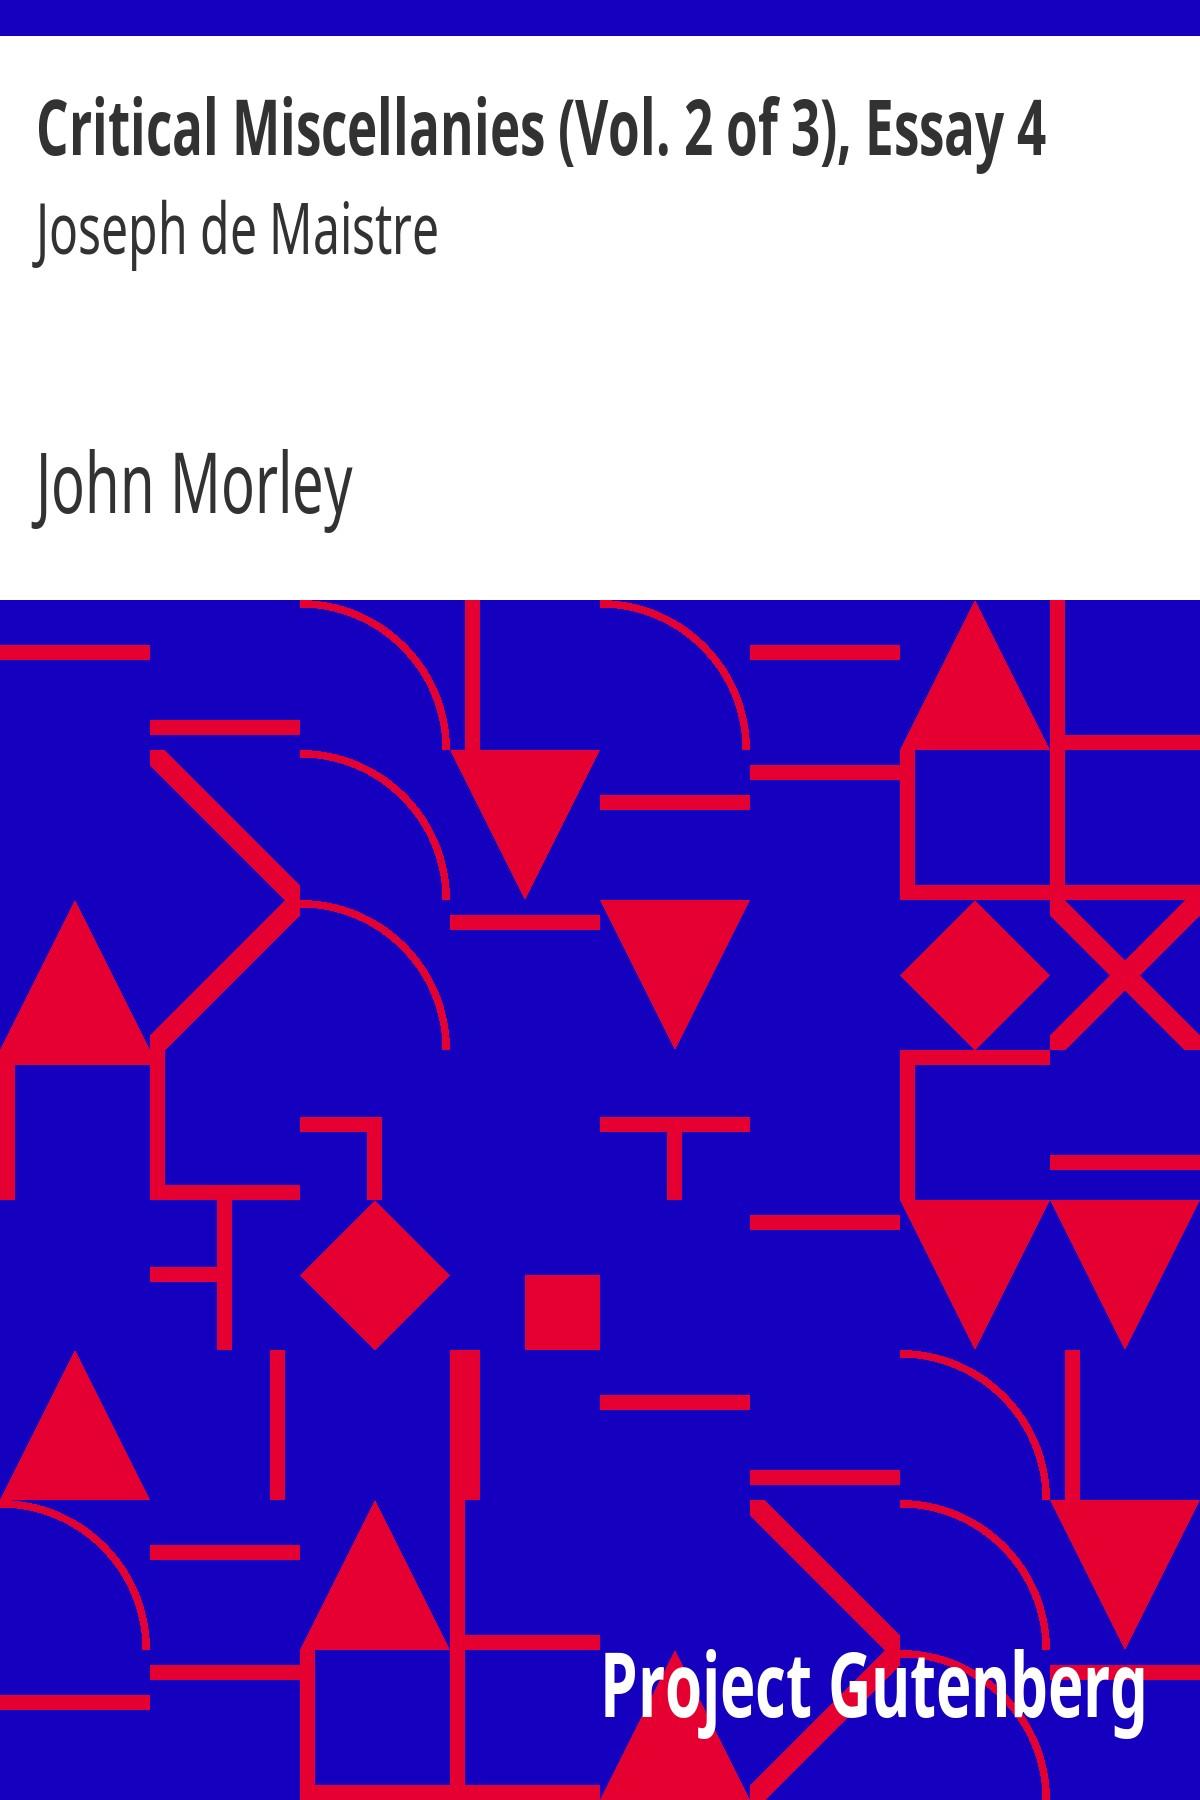 John Morley Critical Miscellanies (Vol. 2 of 3), Essay 4: Joseph de Maistre